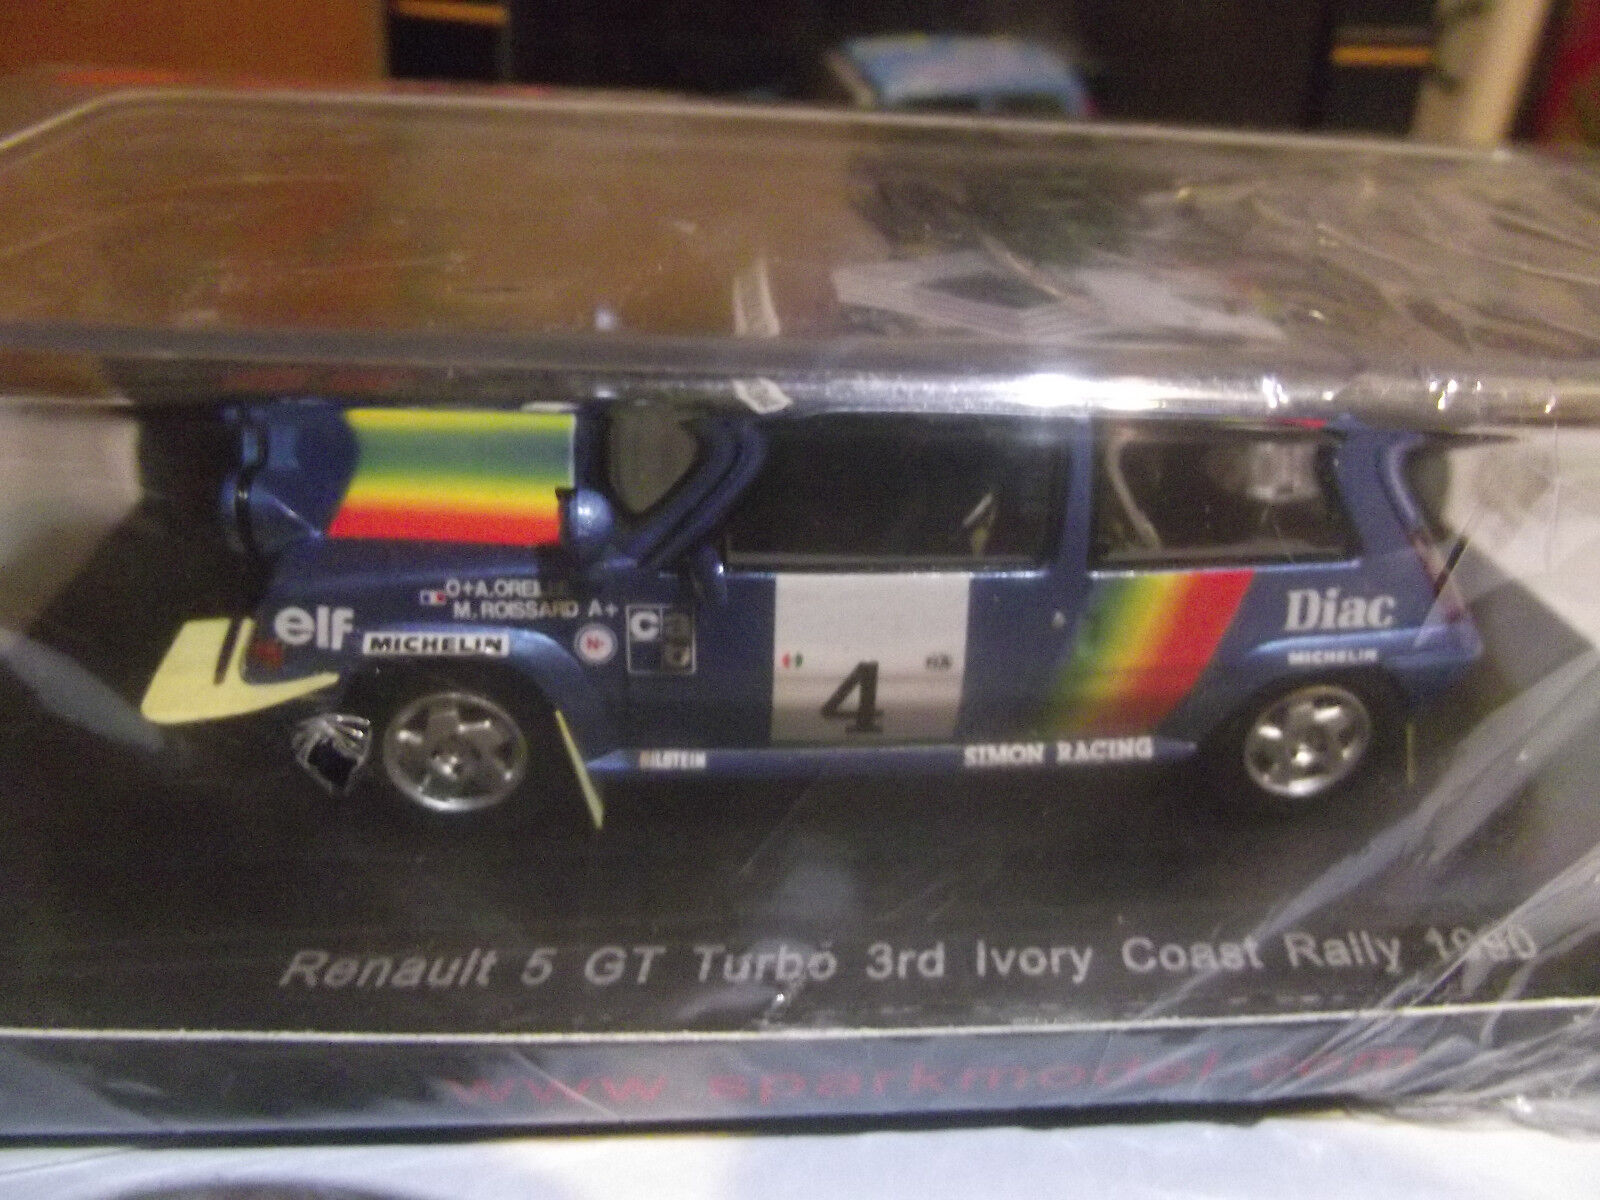 1:43 Spark 3860 Rallye Bandama Cote Ivoire 1990 Renault 5 GT Turbo Oreille